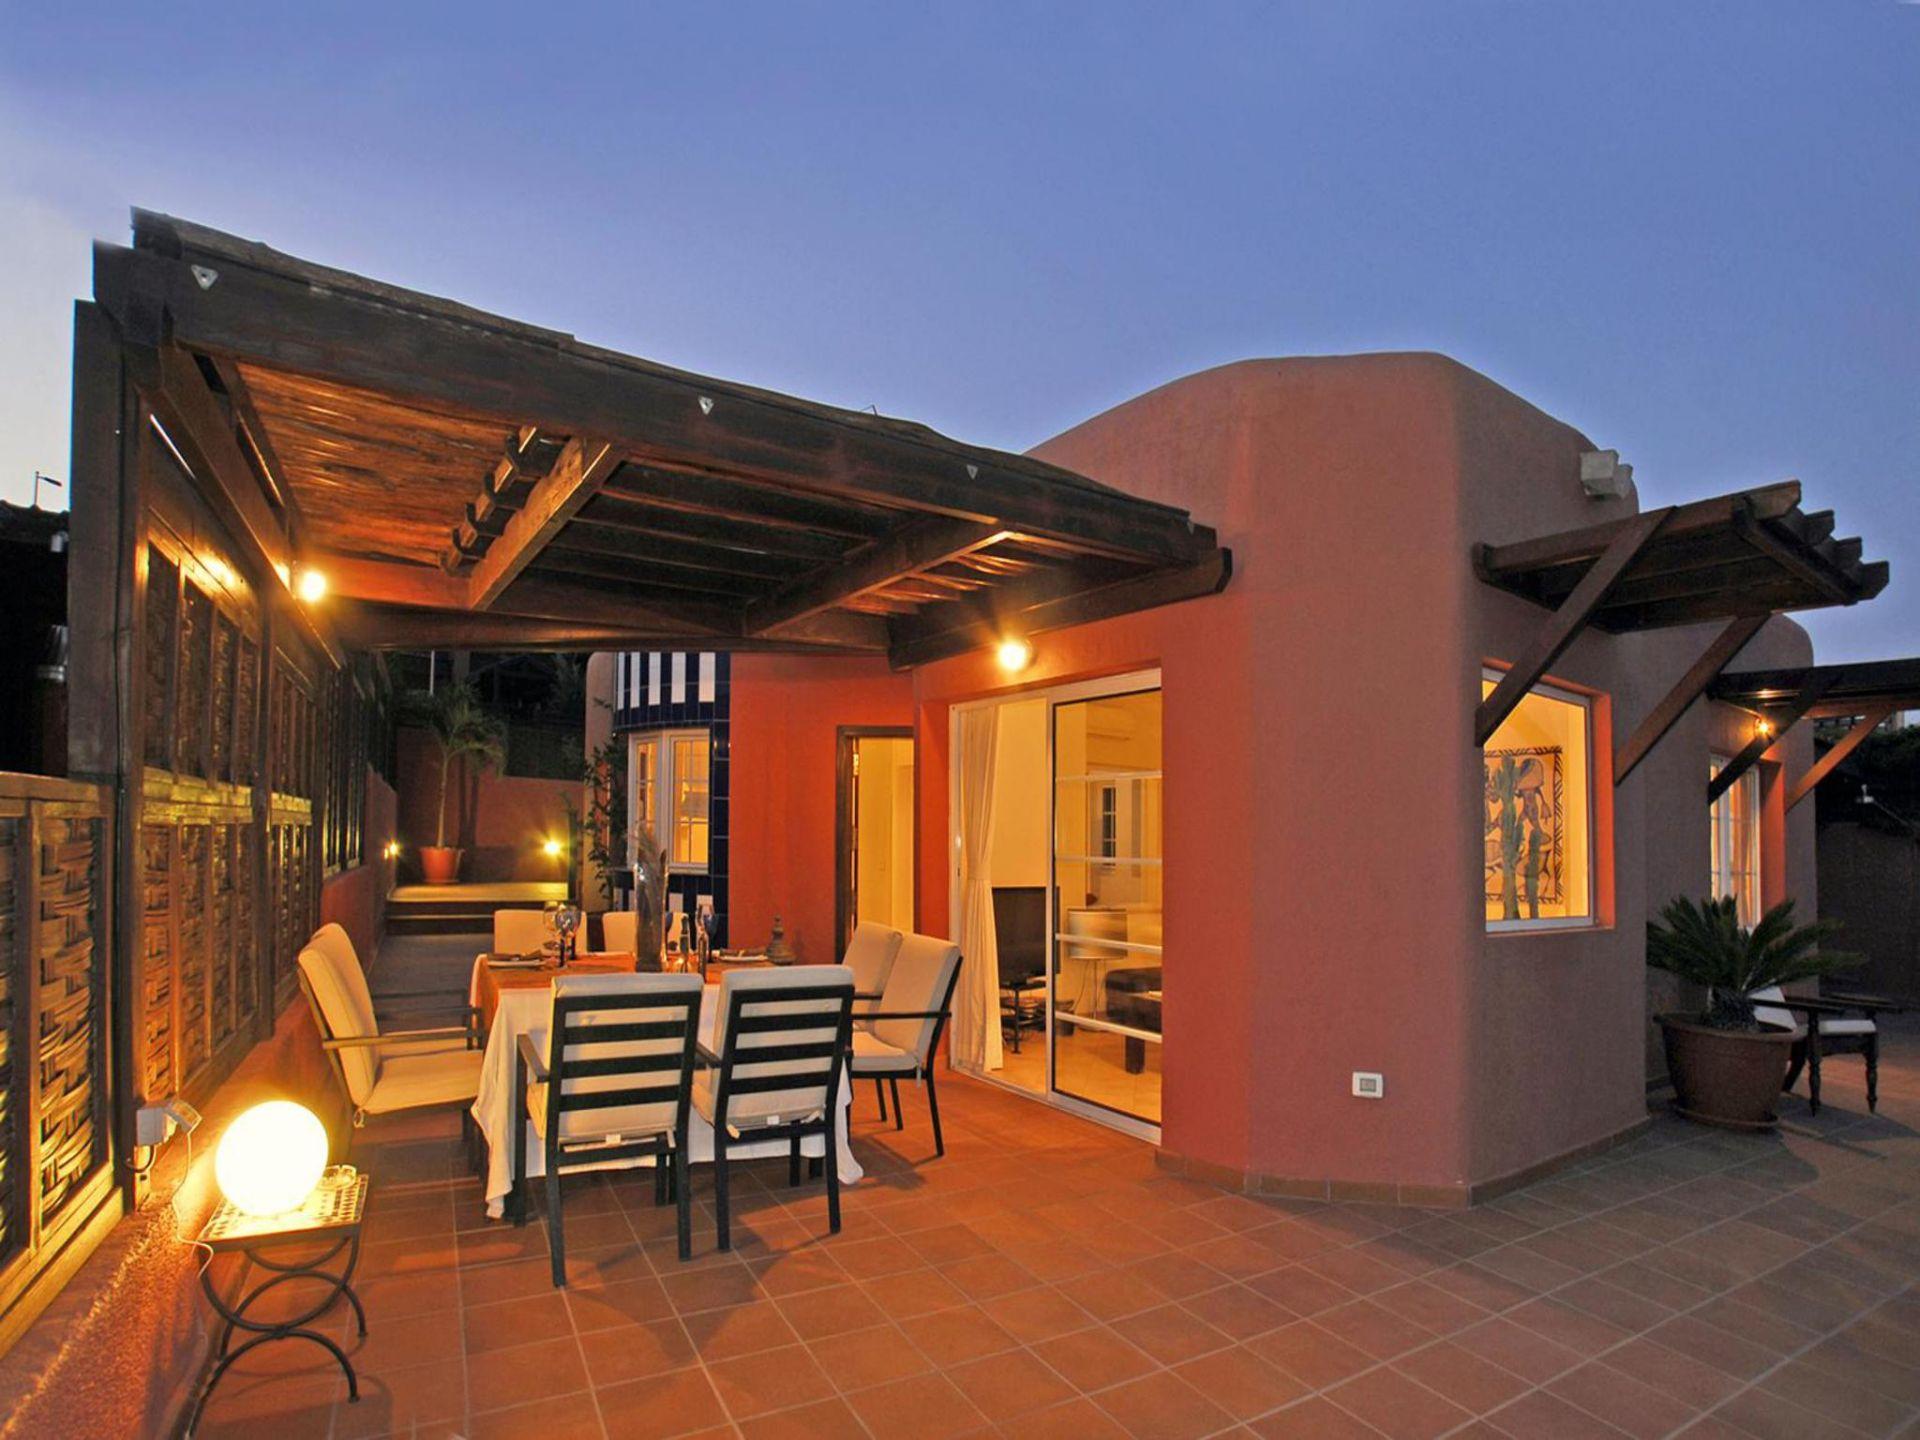 Holiday apartment Villa San Agustin 10 - Holiday Rental (854295), Maspalomas, Gran Canaria, Canary Islands, Spain, picture 35